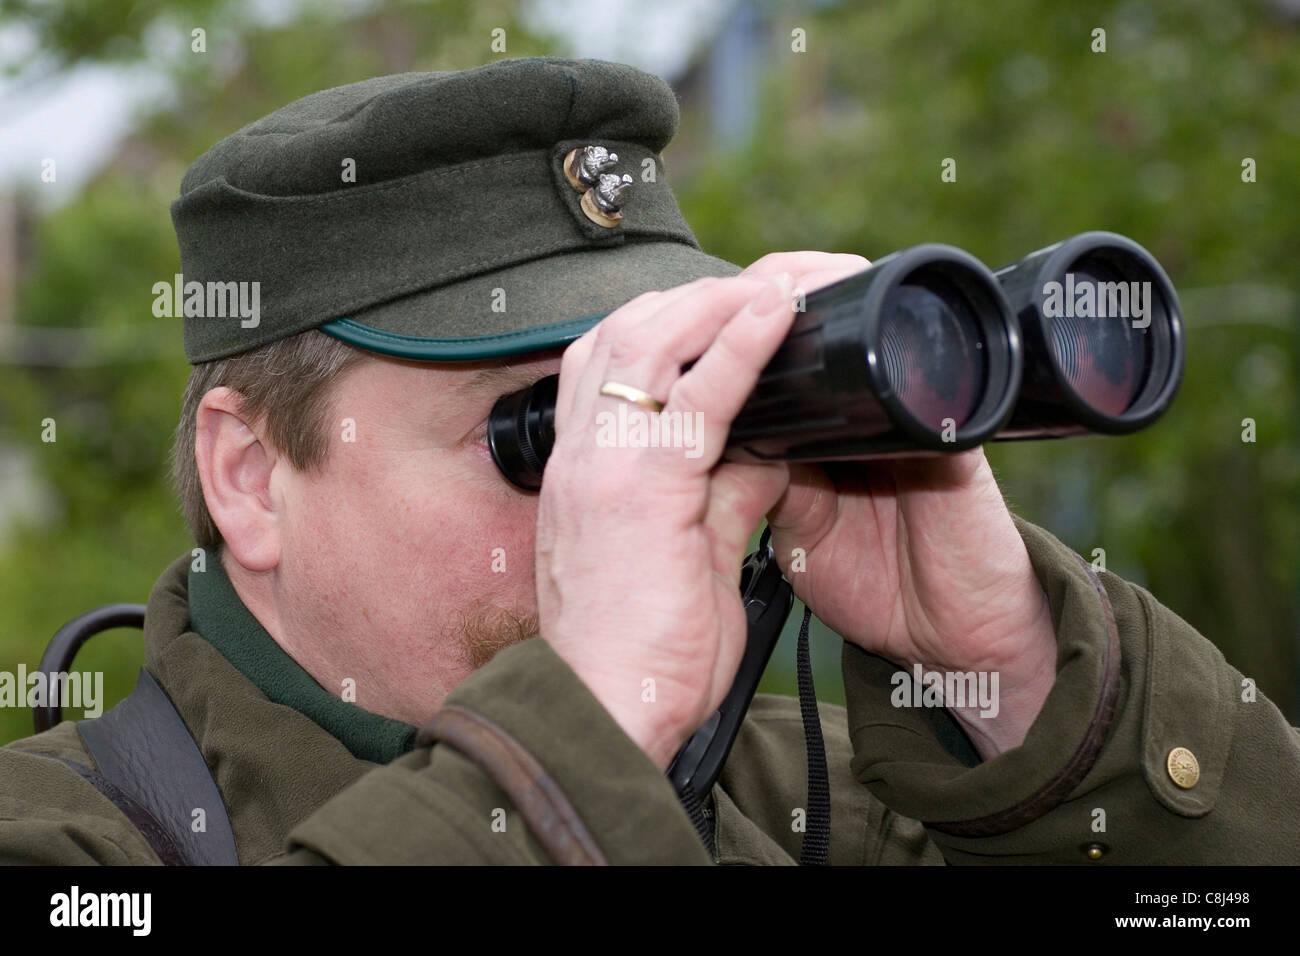 Hunter, Rifleman, hunt, go hunting, race, sight, envisage, binoculars, look, looks, deerstalking, stalk Stock Photo